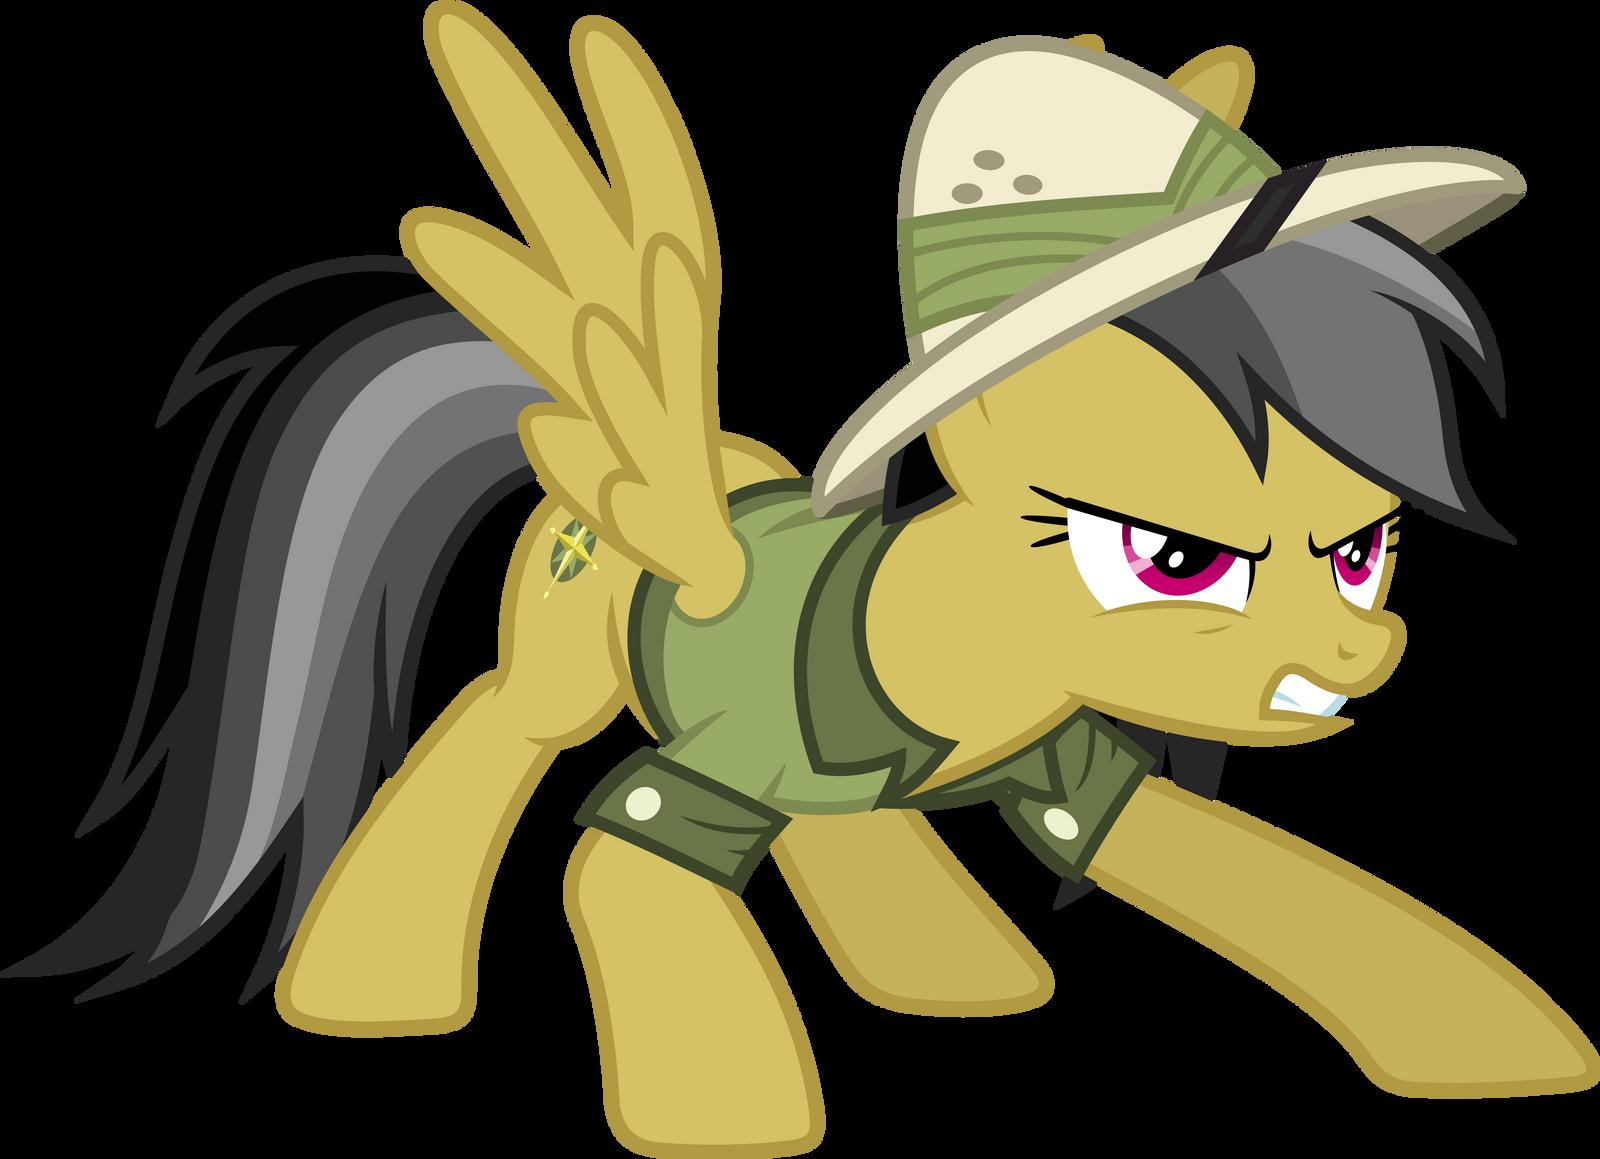 daring do on Pinterest | Equestria Girls, Chibi and deviantART